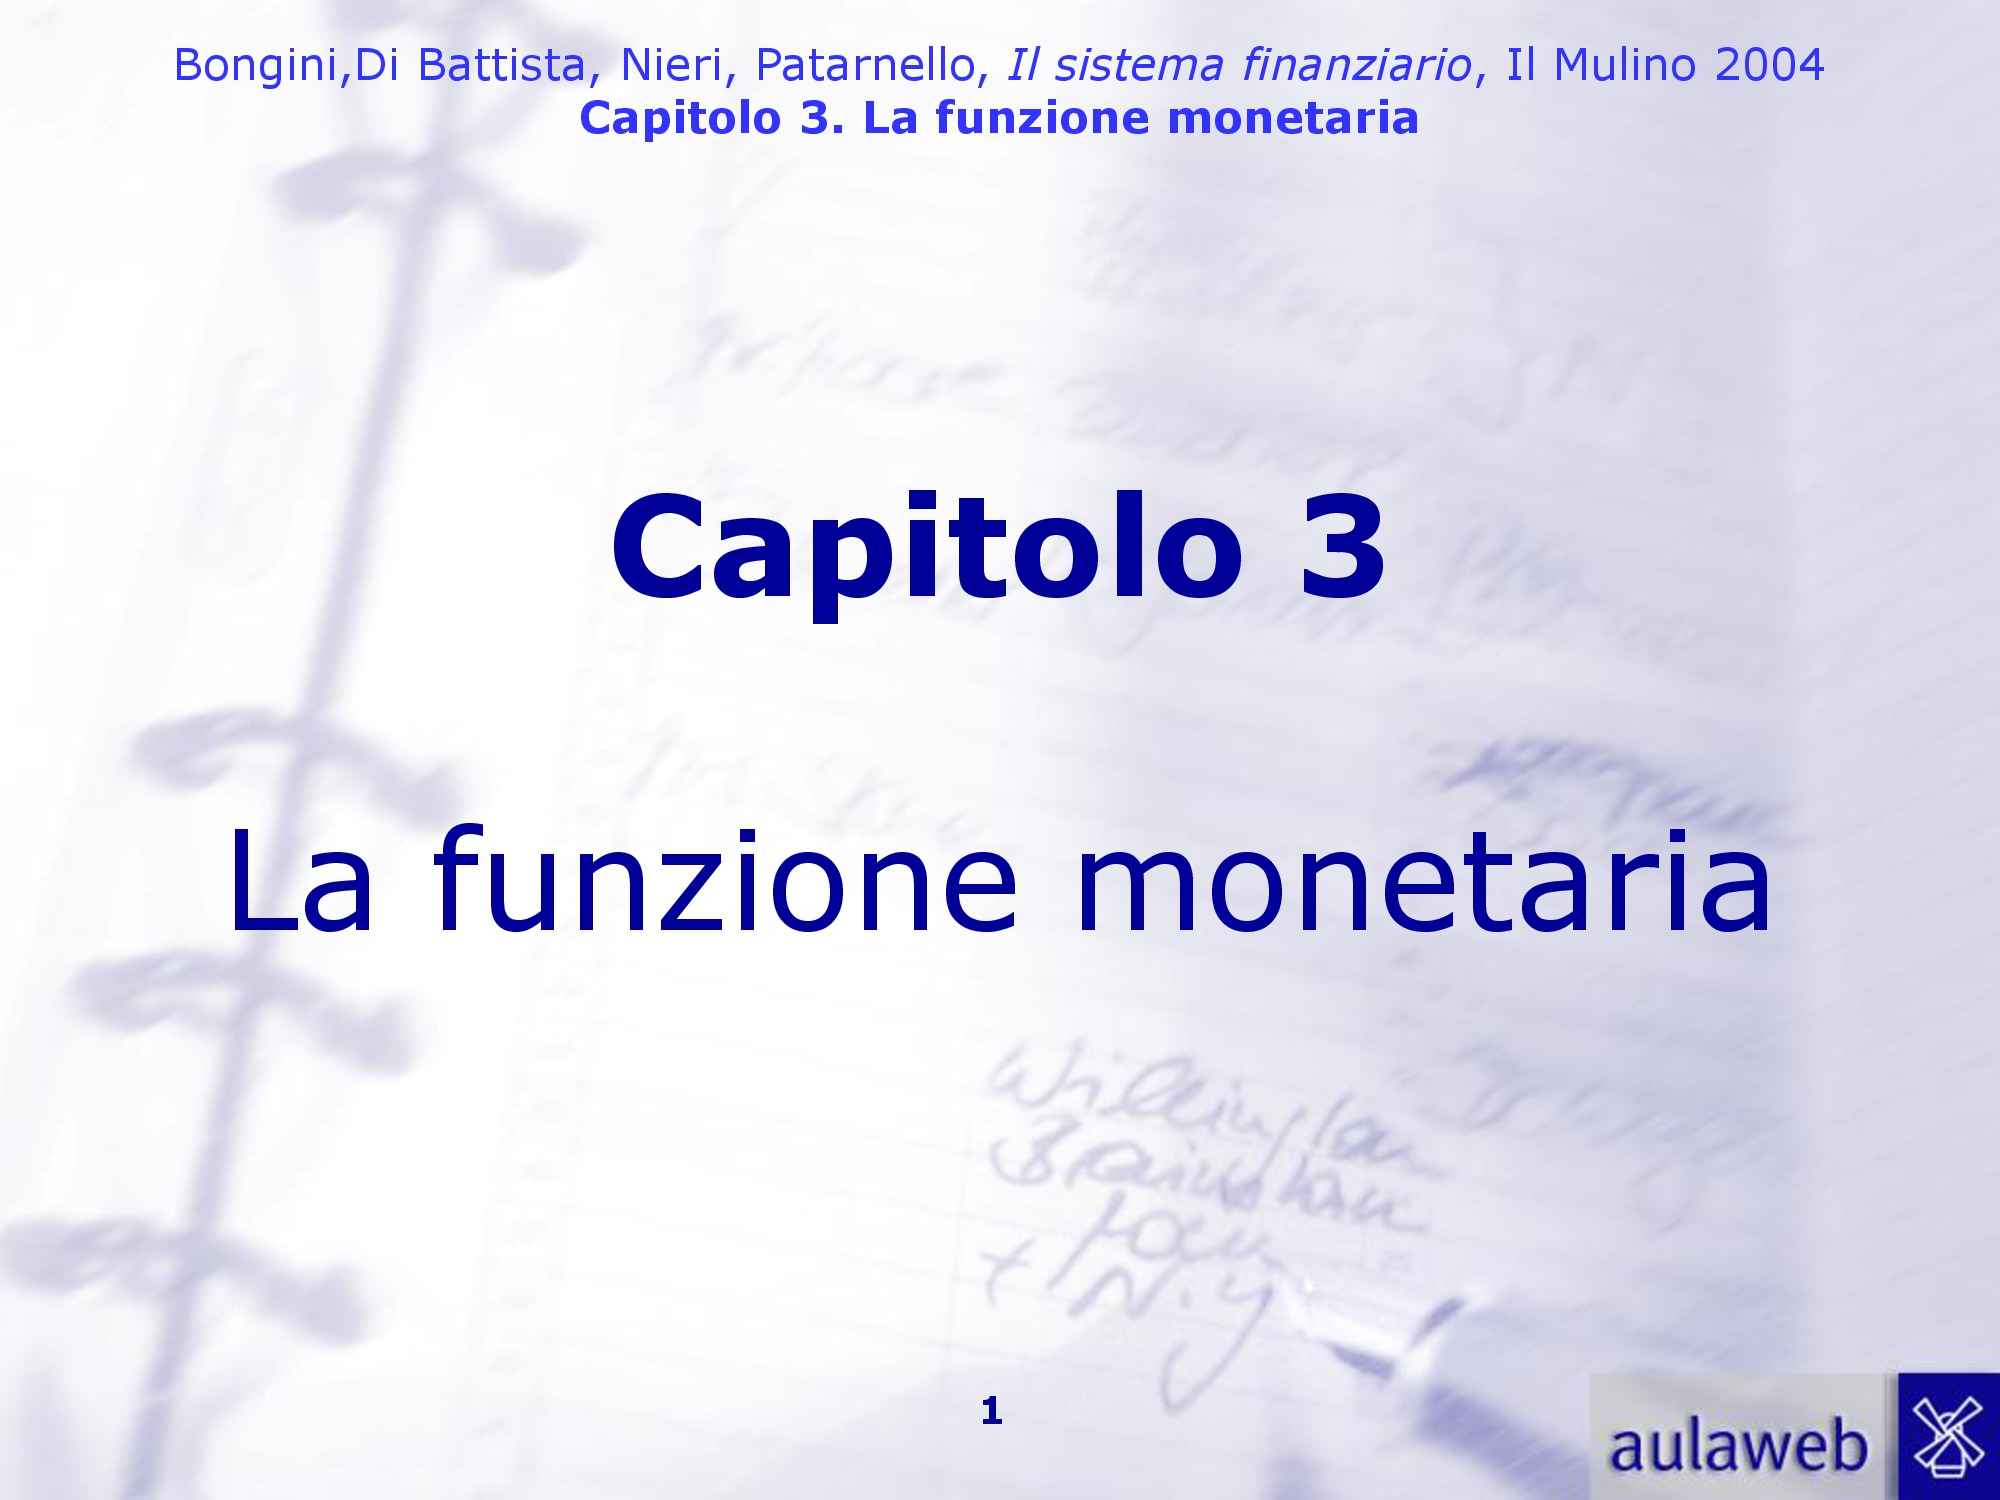 Funzione monetaria